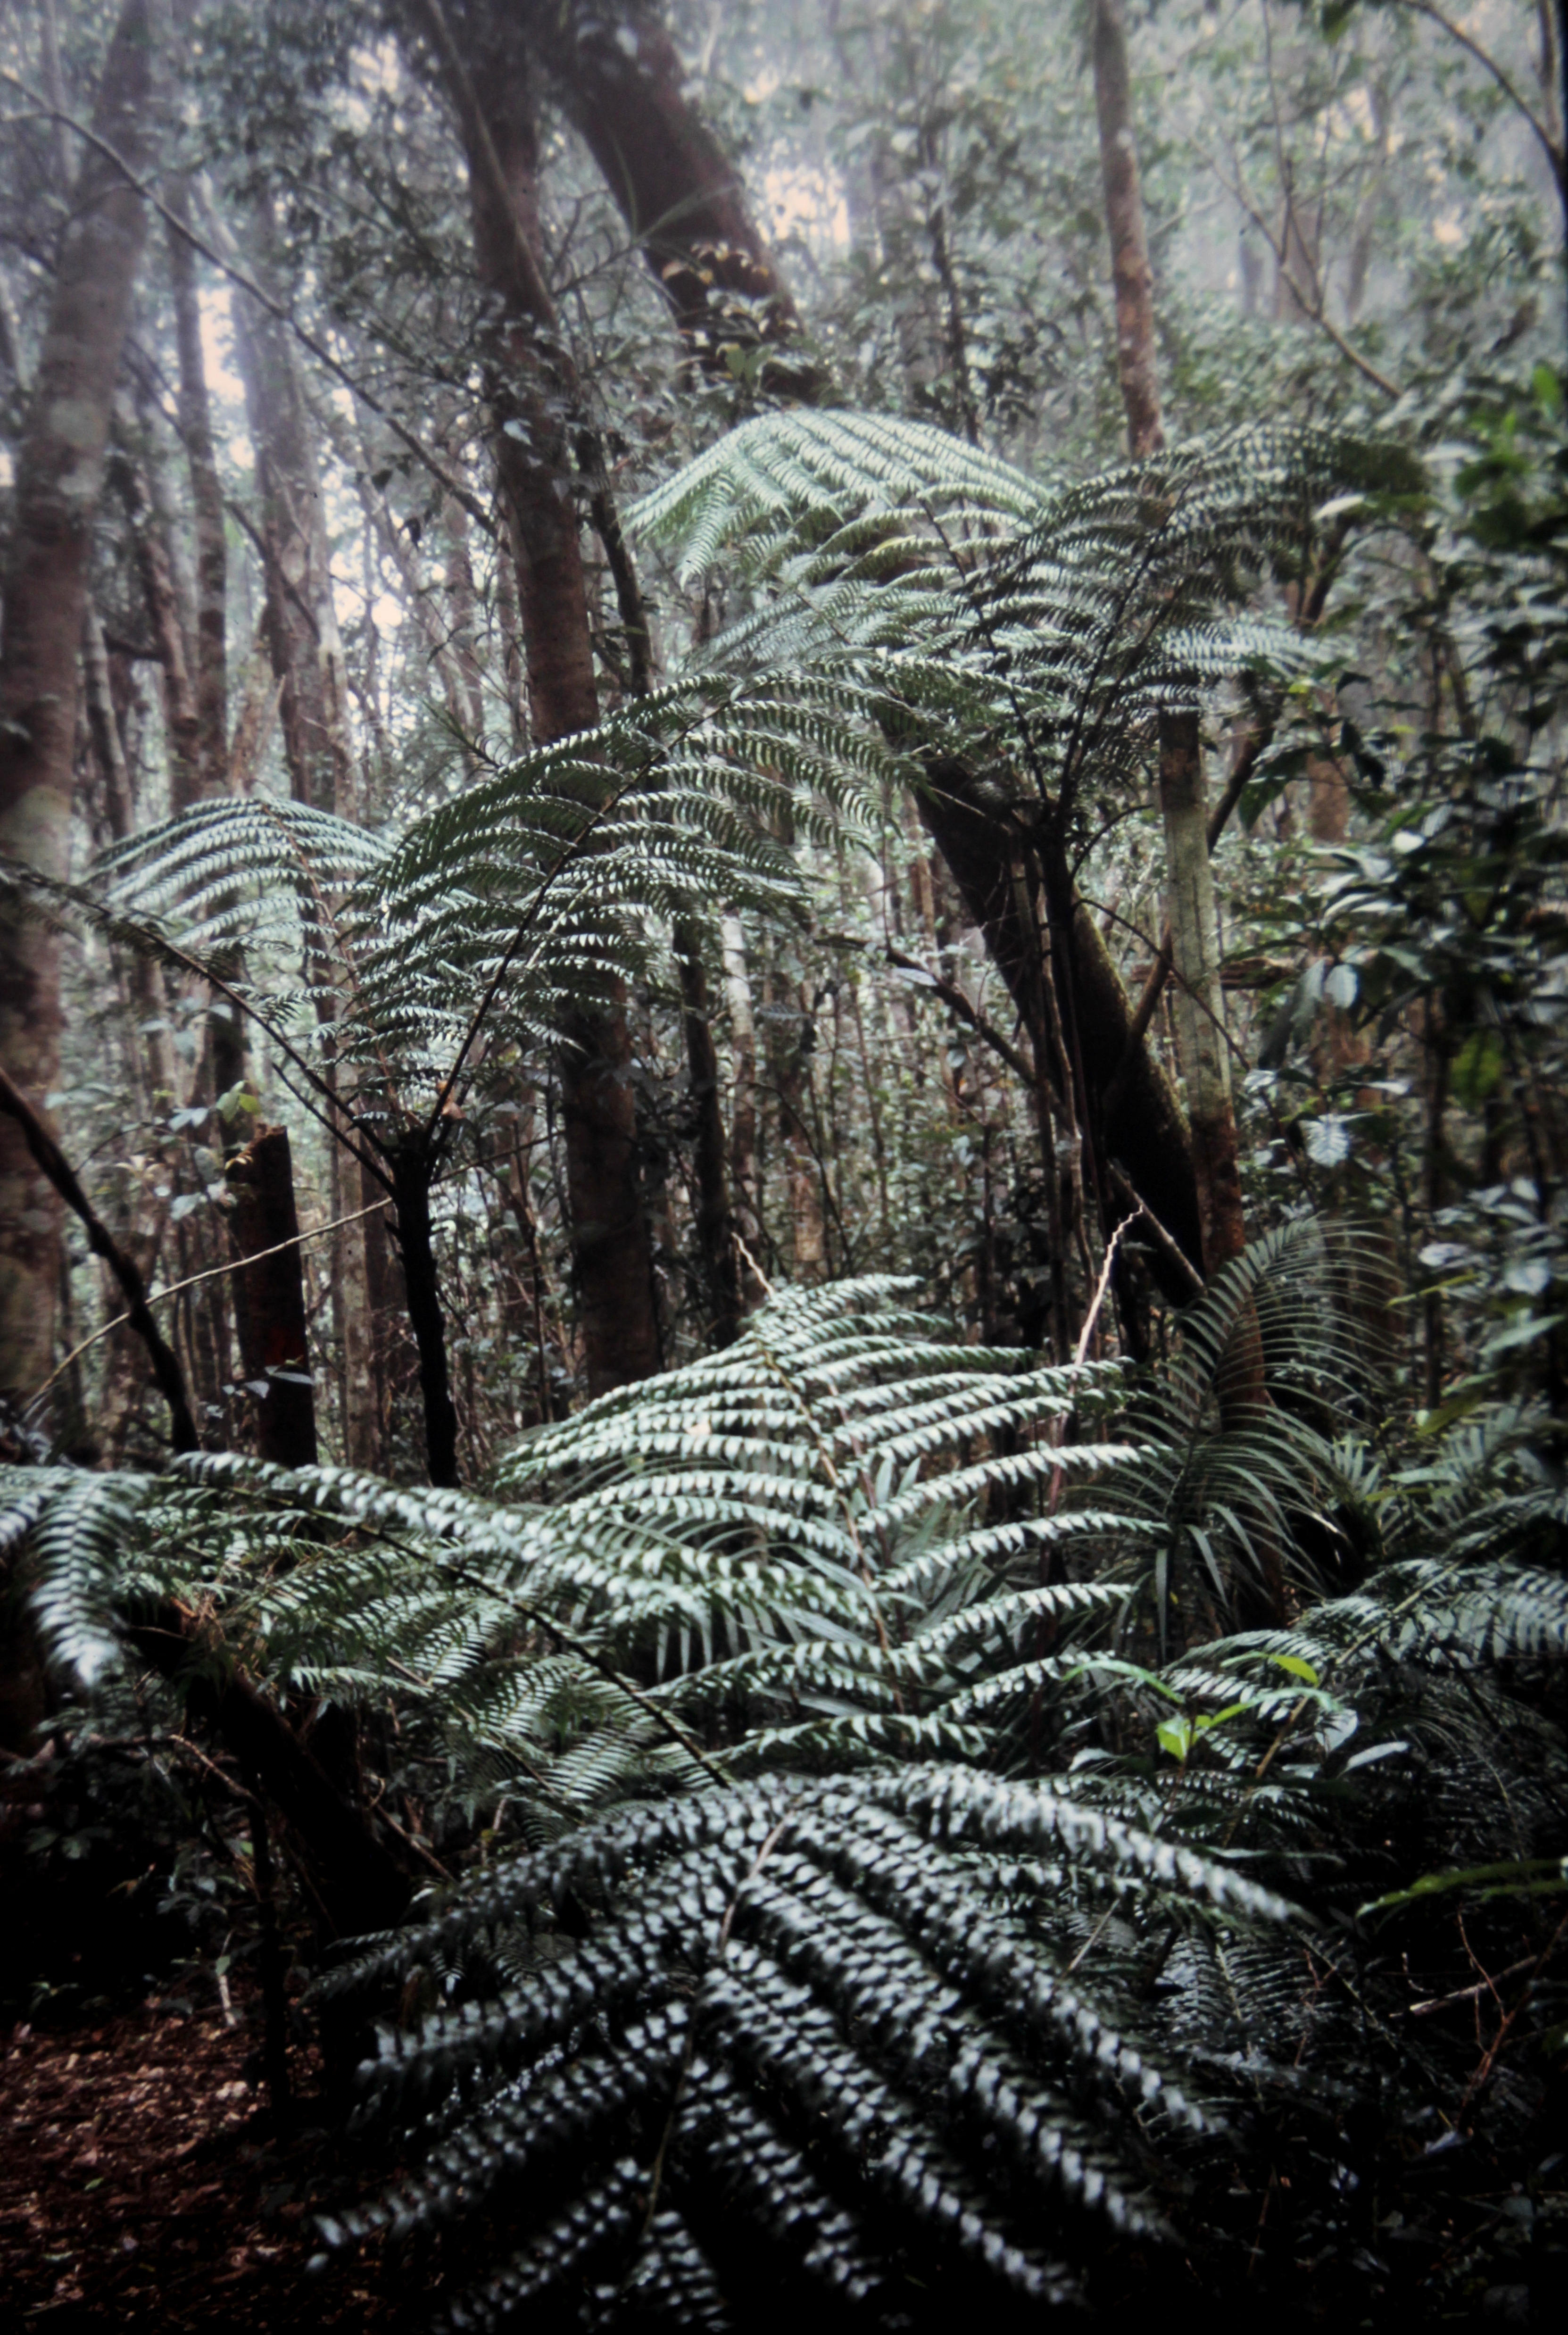 Image of black tree fern